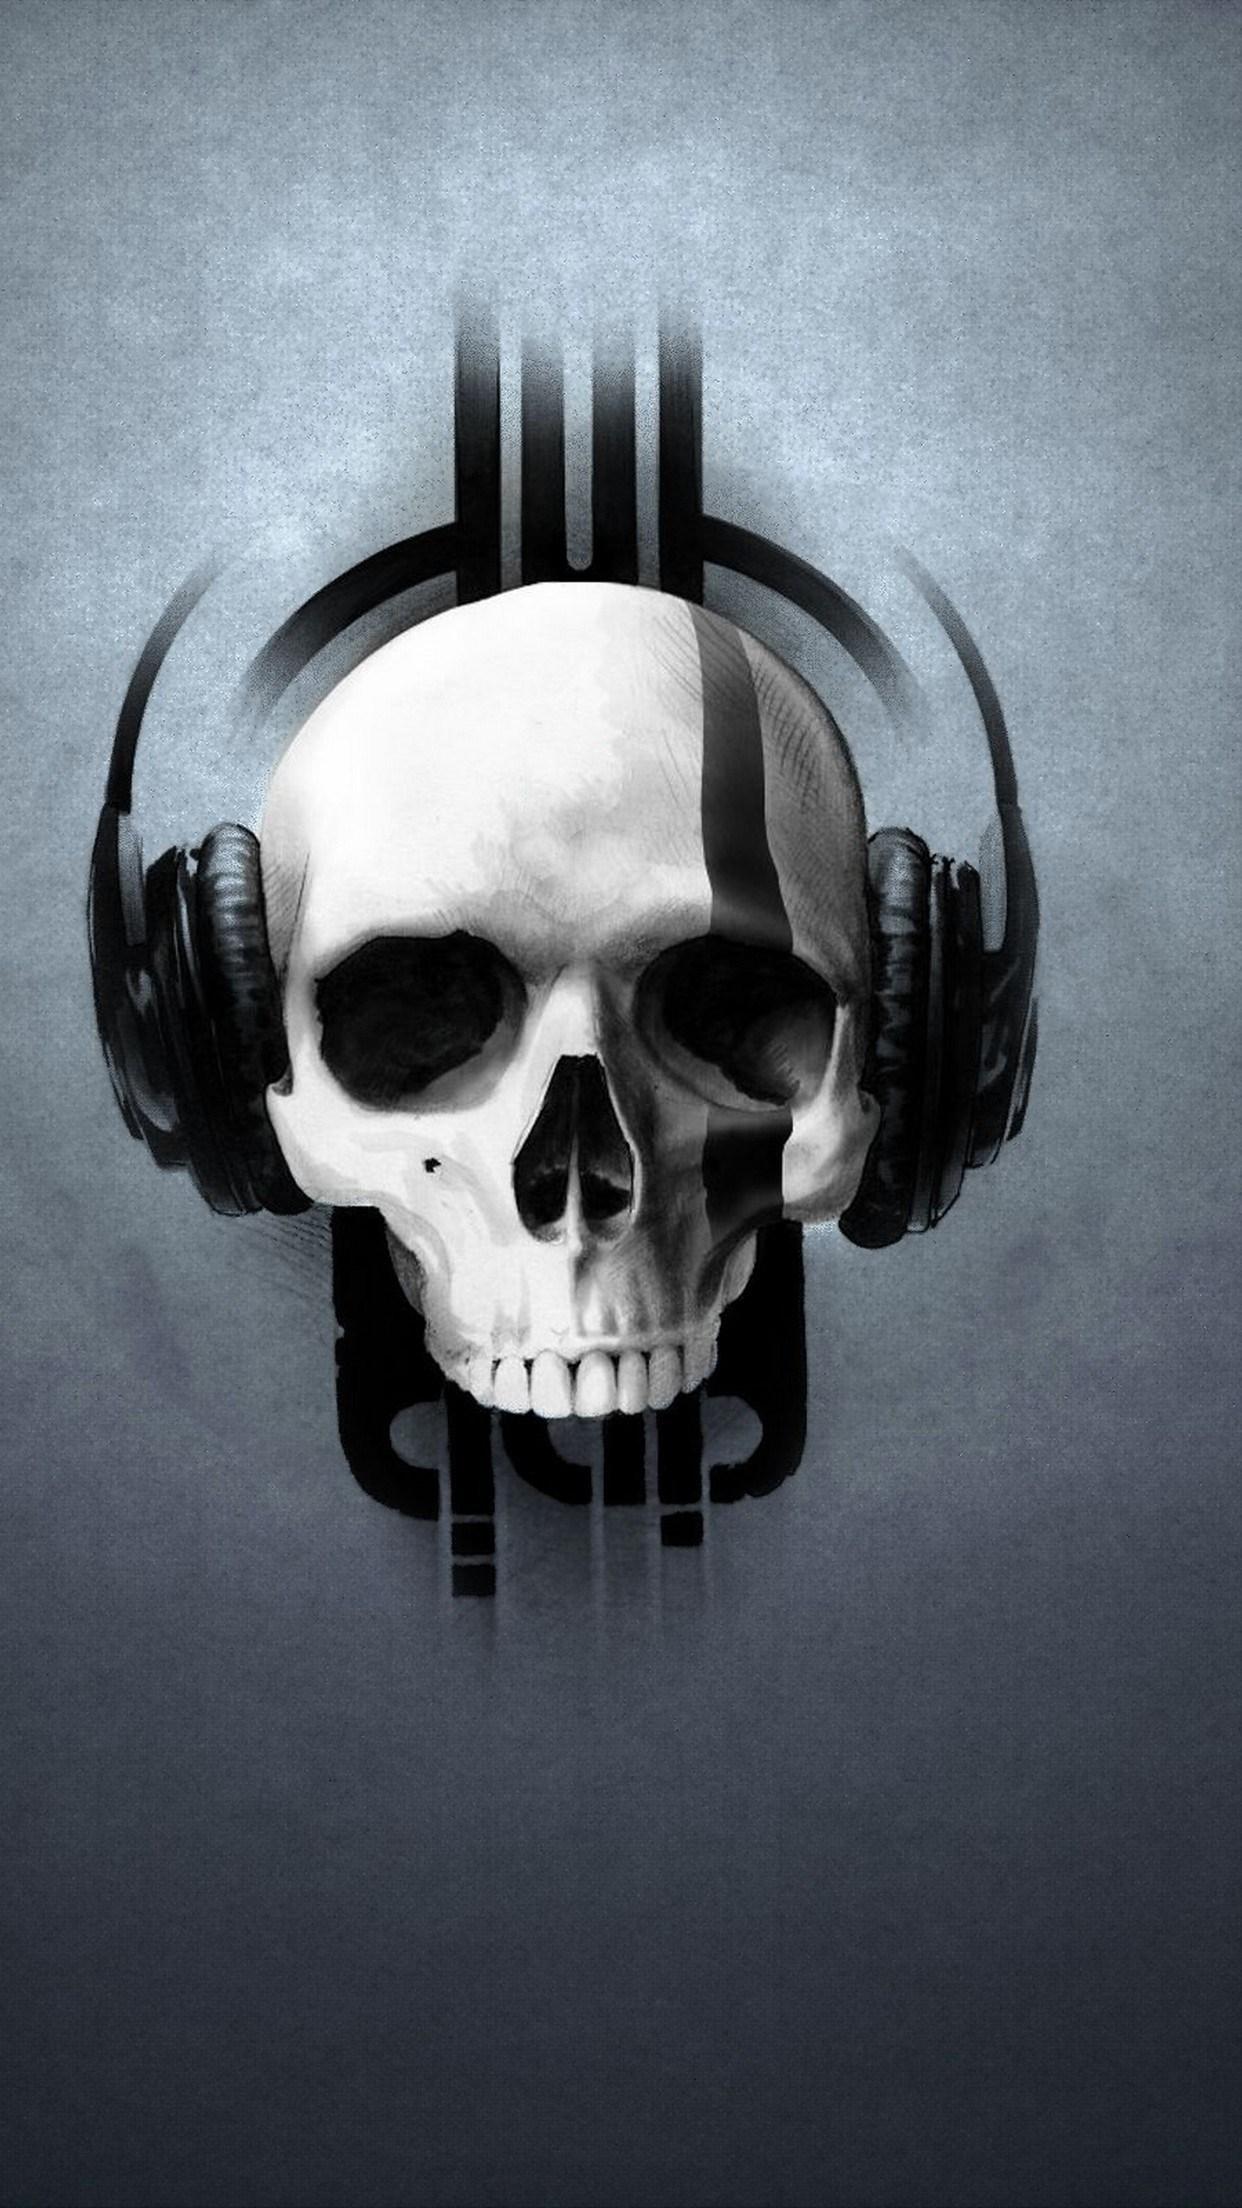 music skull 3Wallpapers iPhone Parallax Music Skull